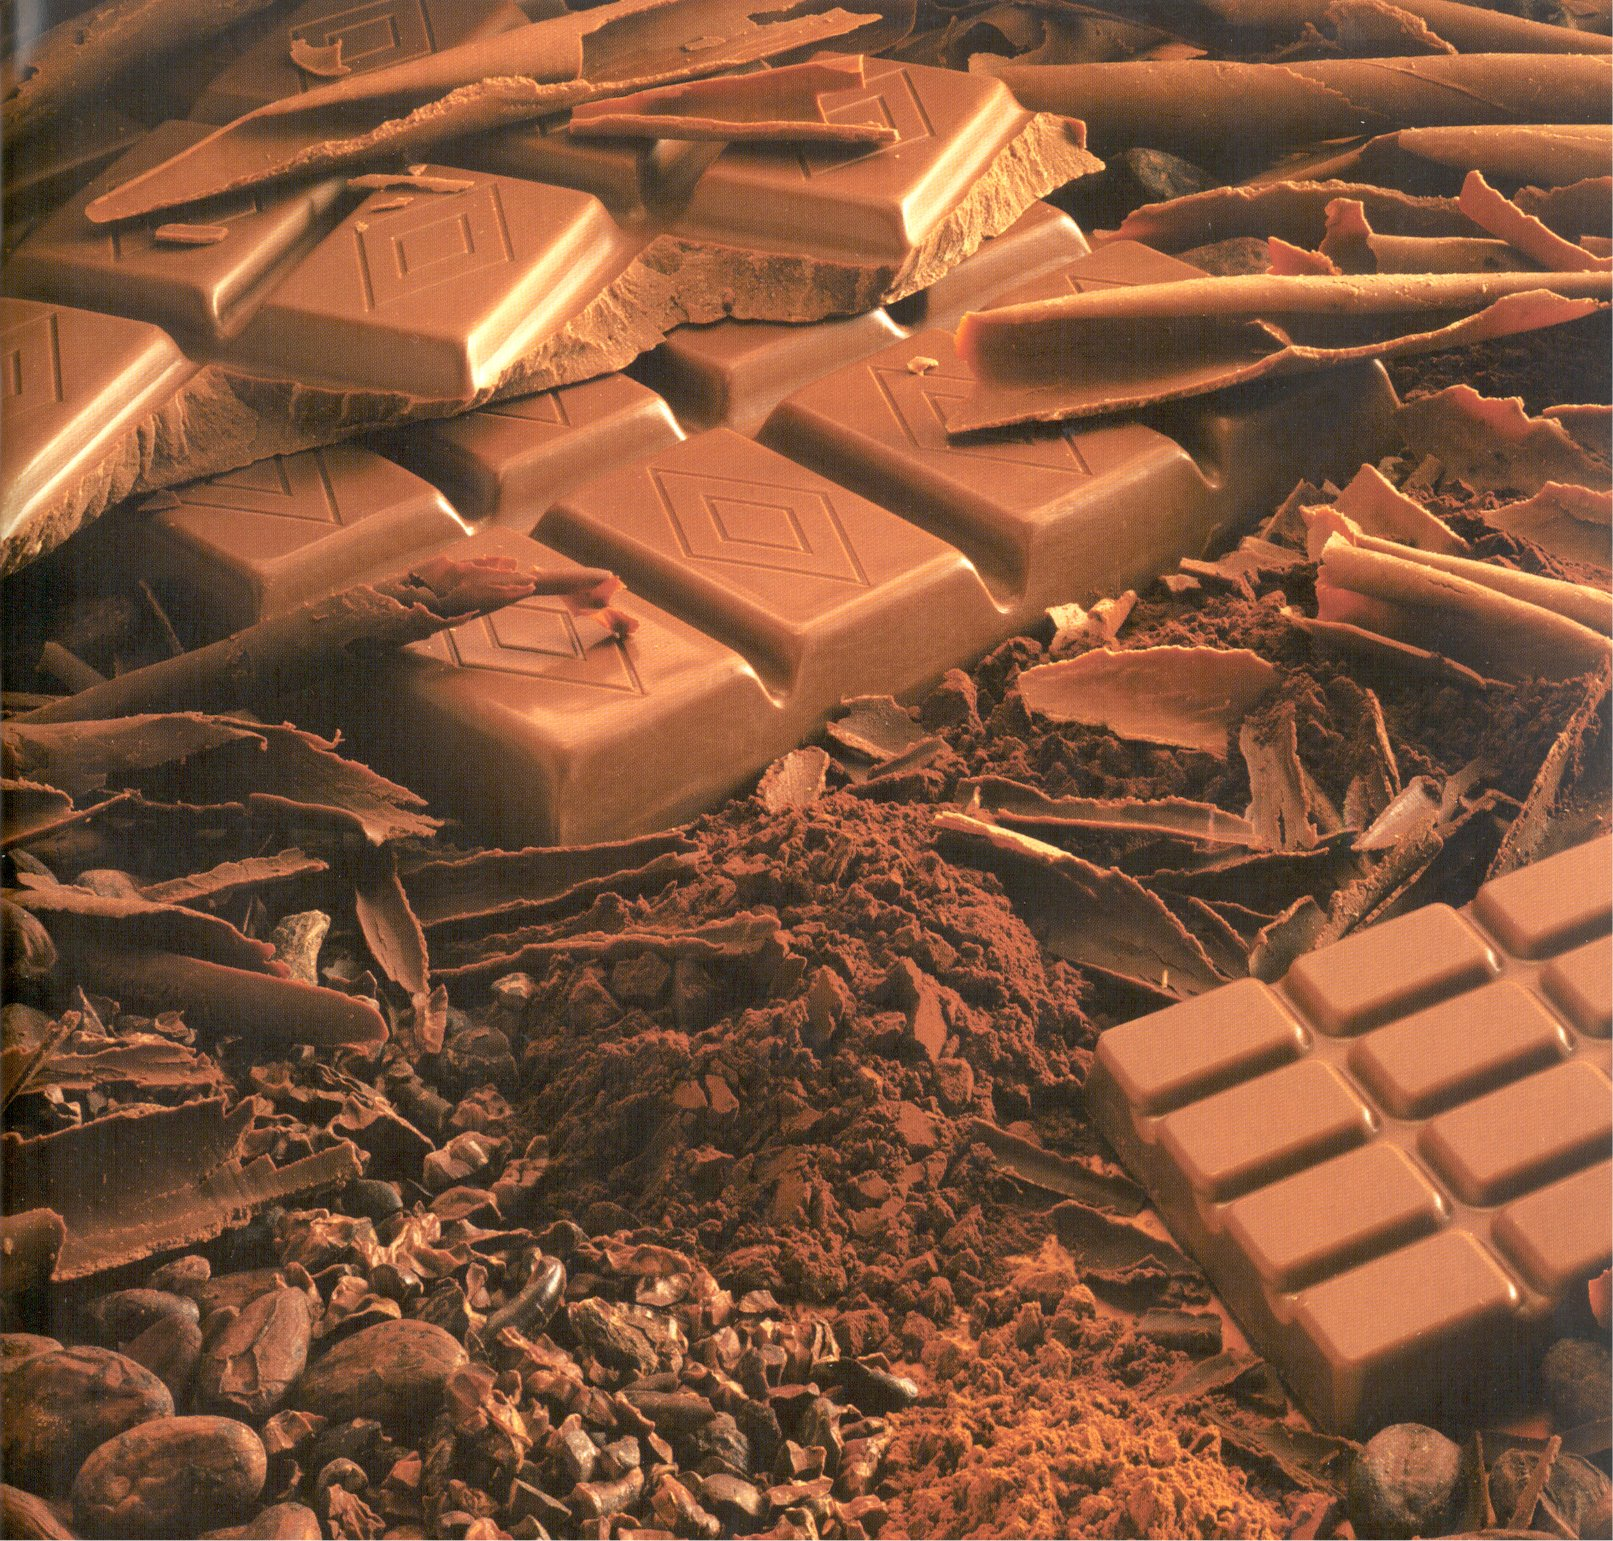 http://www.popote-et-casseroles.fr/wp-content/uploads/Chocolats%20bellevue/Chocolat.jpg